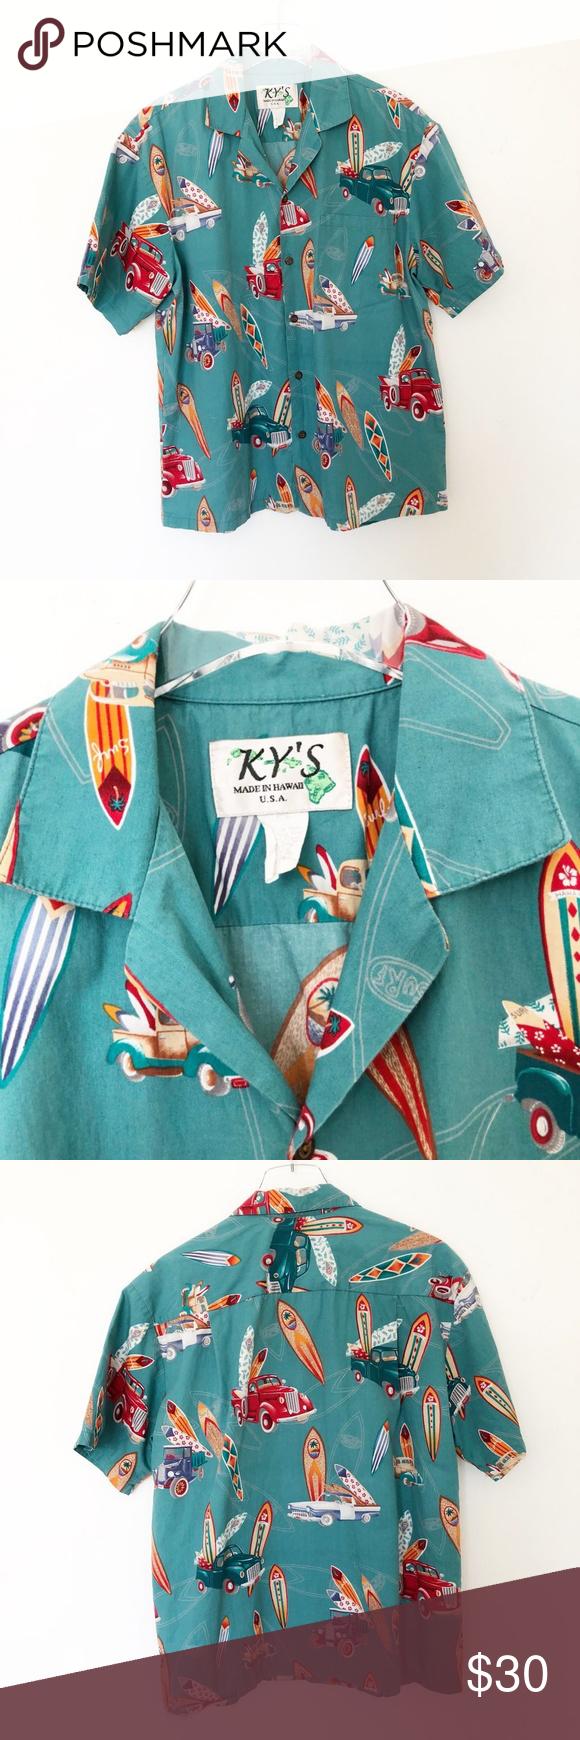 Vintage Kys Trucks Surfboards Hawaiian Shirt L Vintage Shirts Clothes Design Hawaiian Shirt